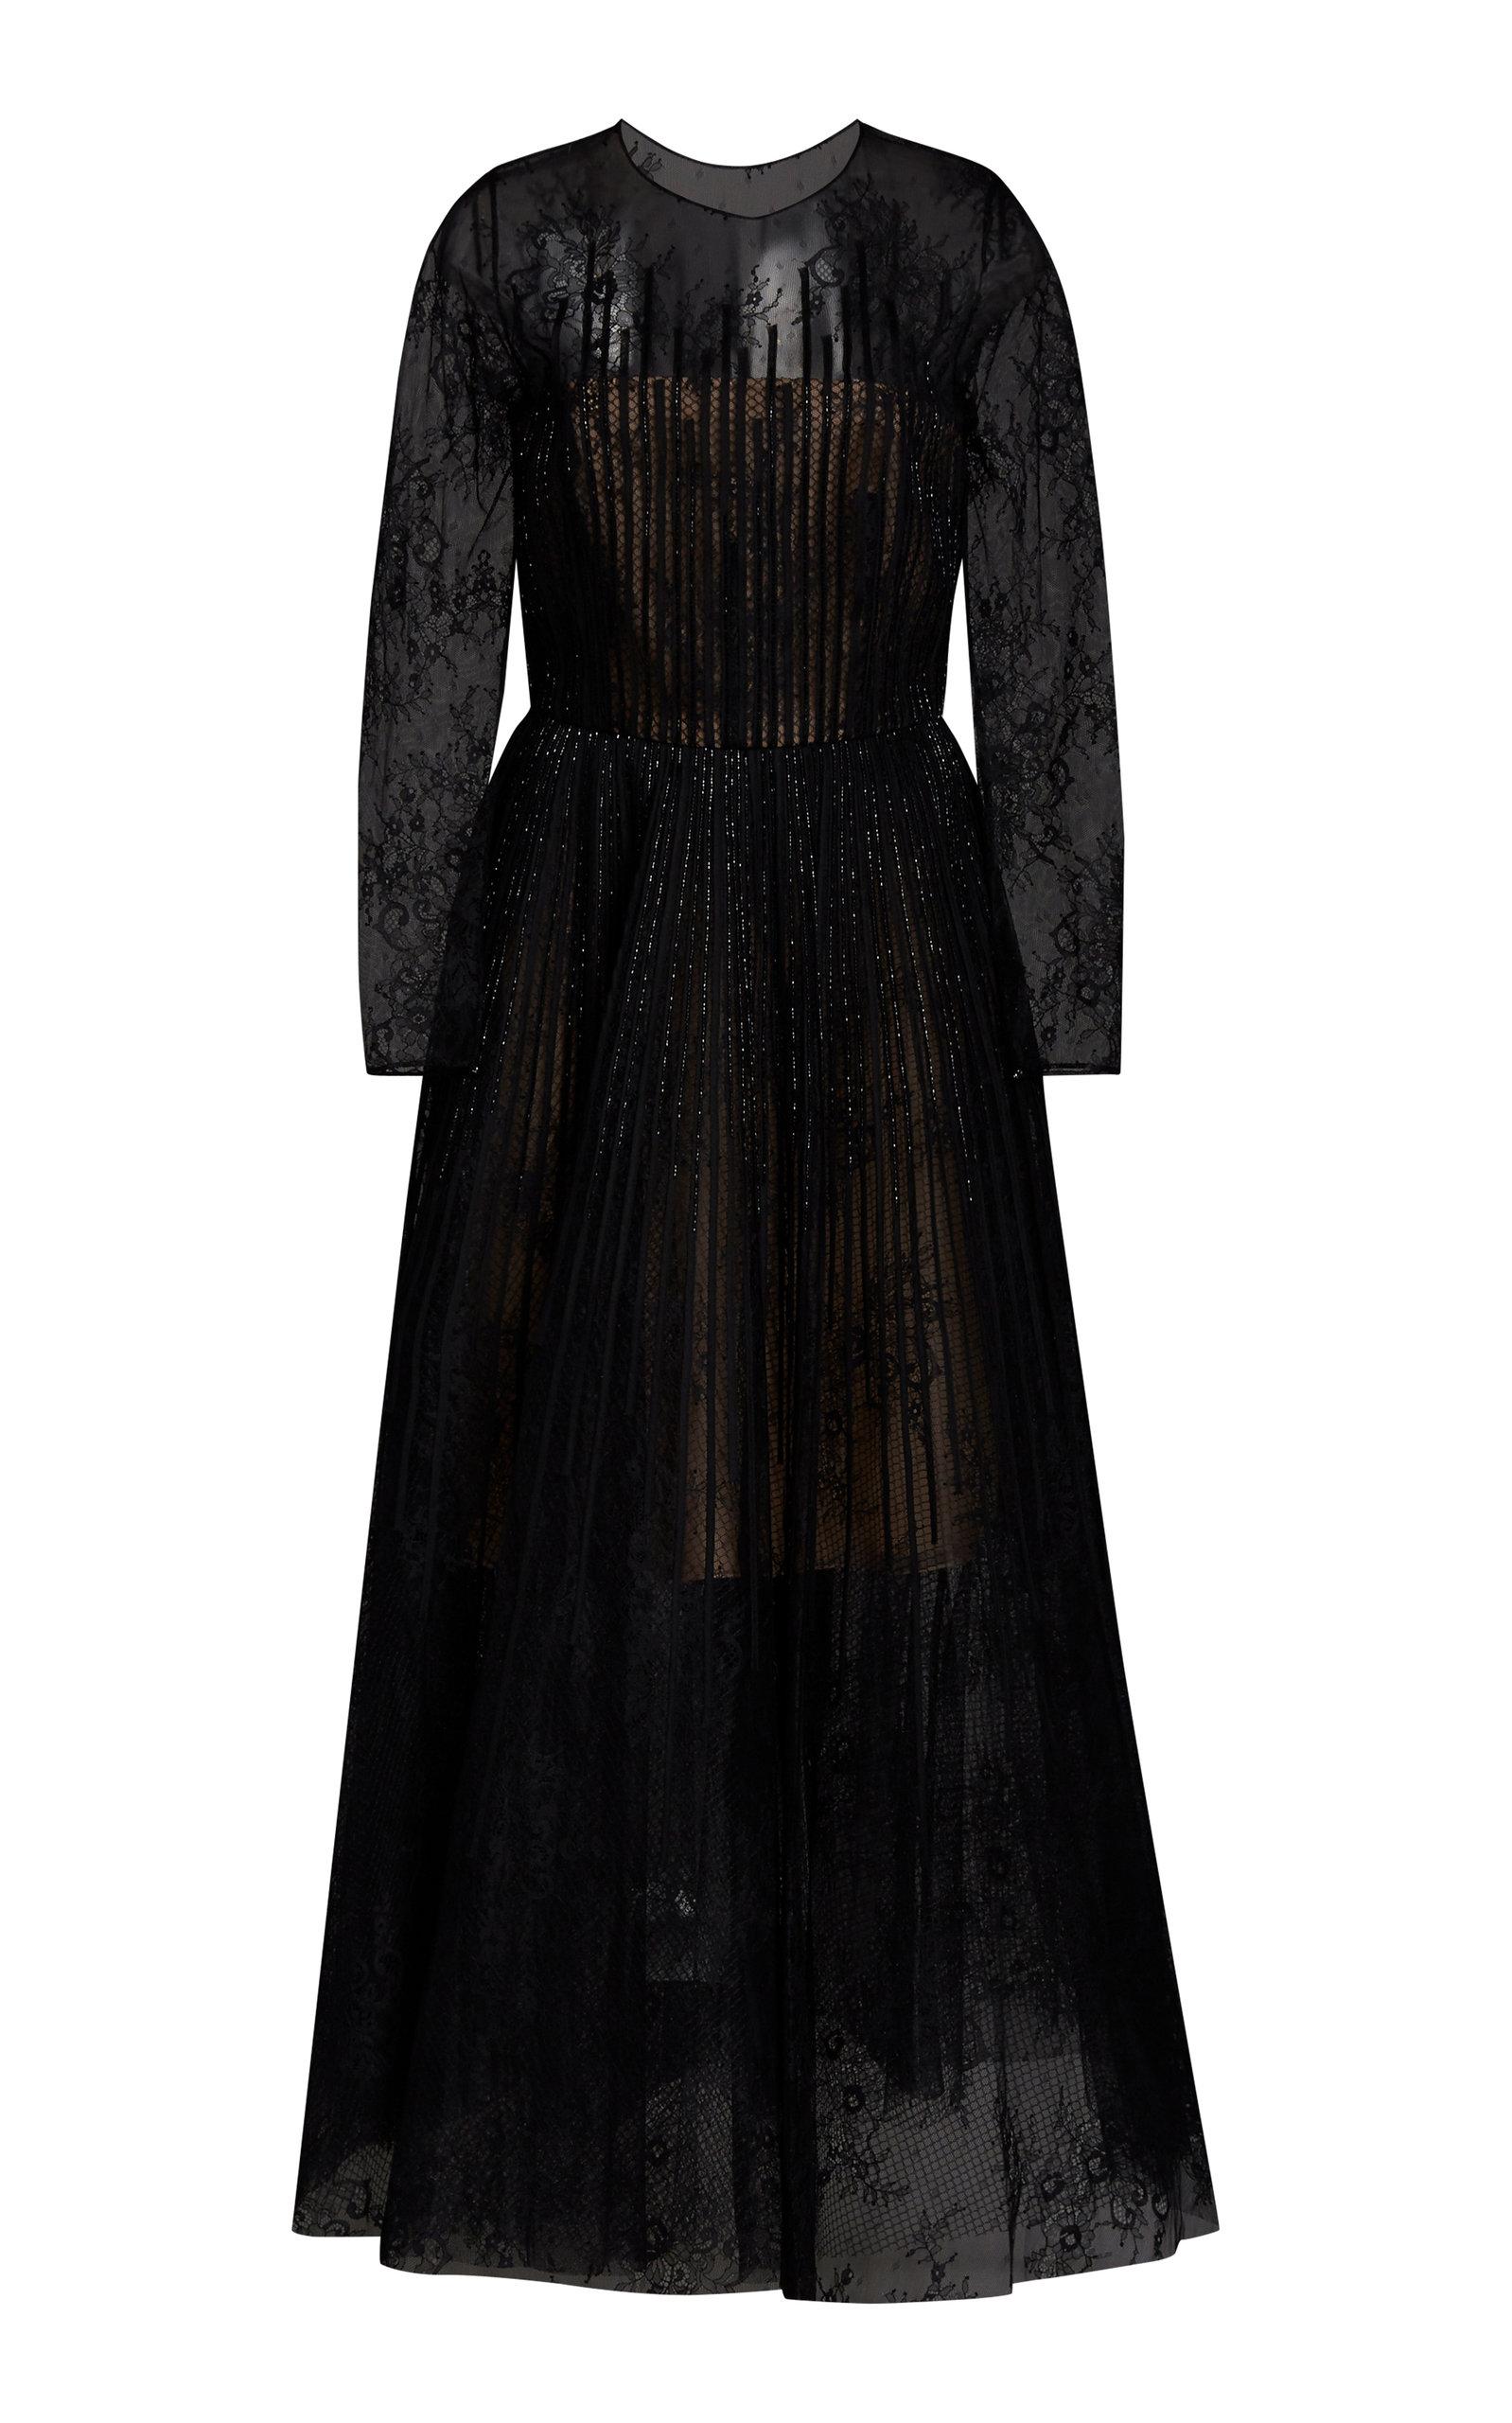 Buy Oscar de la Renta Bead-Embellished Lace Cocktail Dress online, shop Oscar de la Renta at the best price